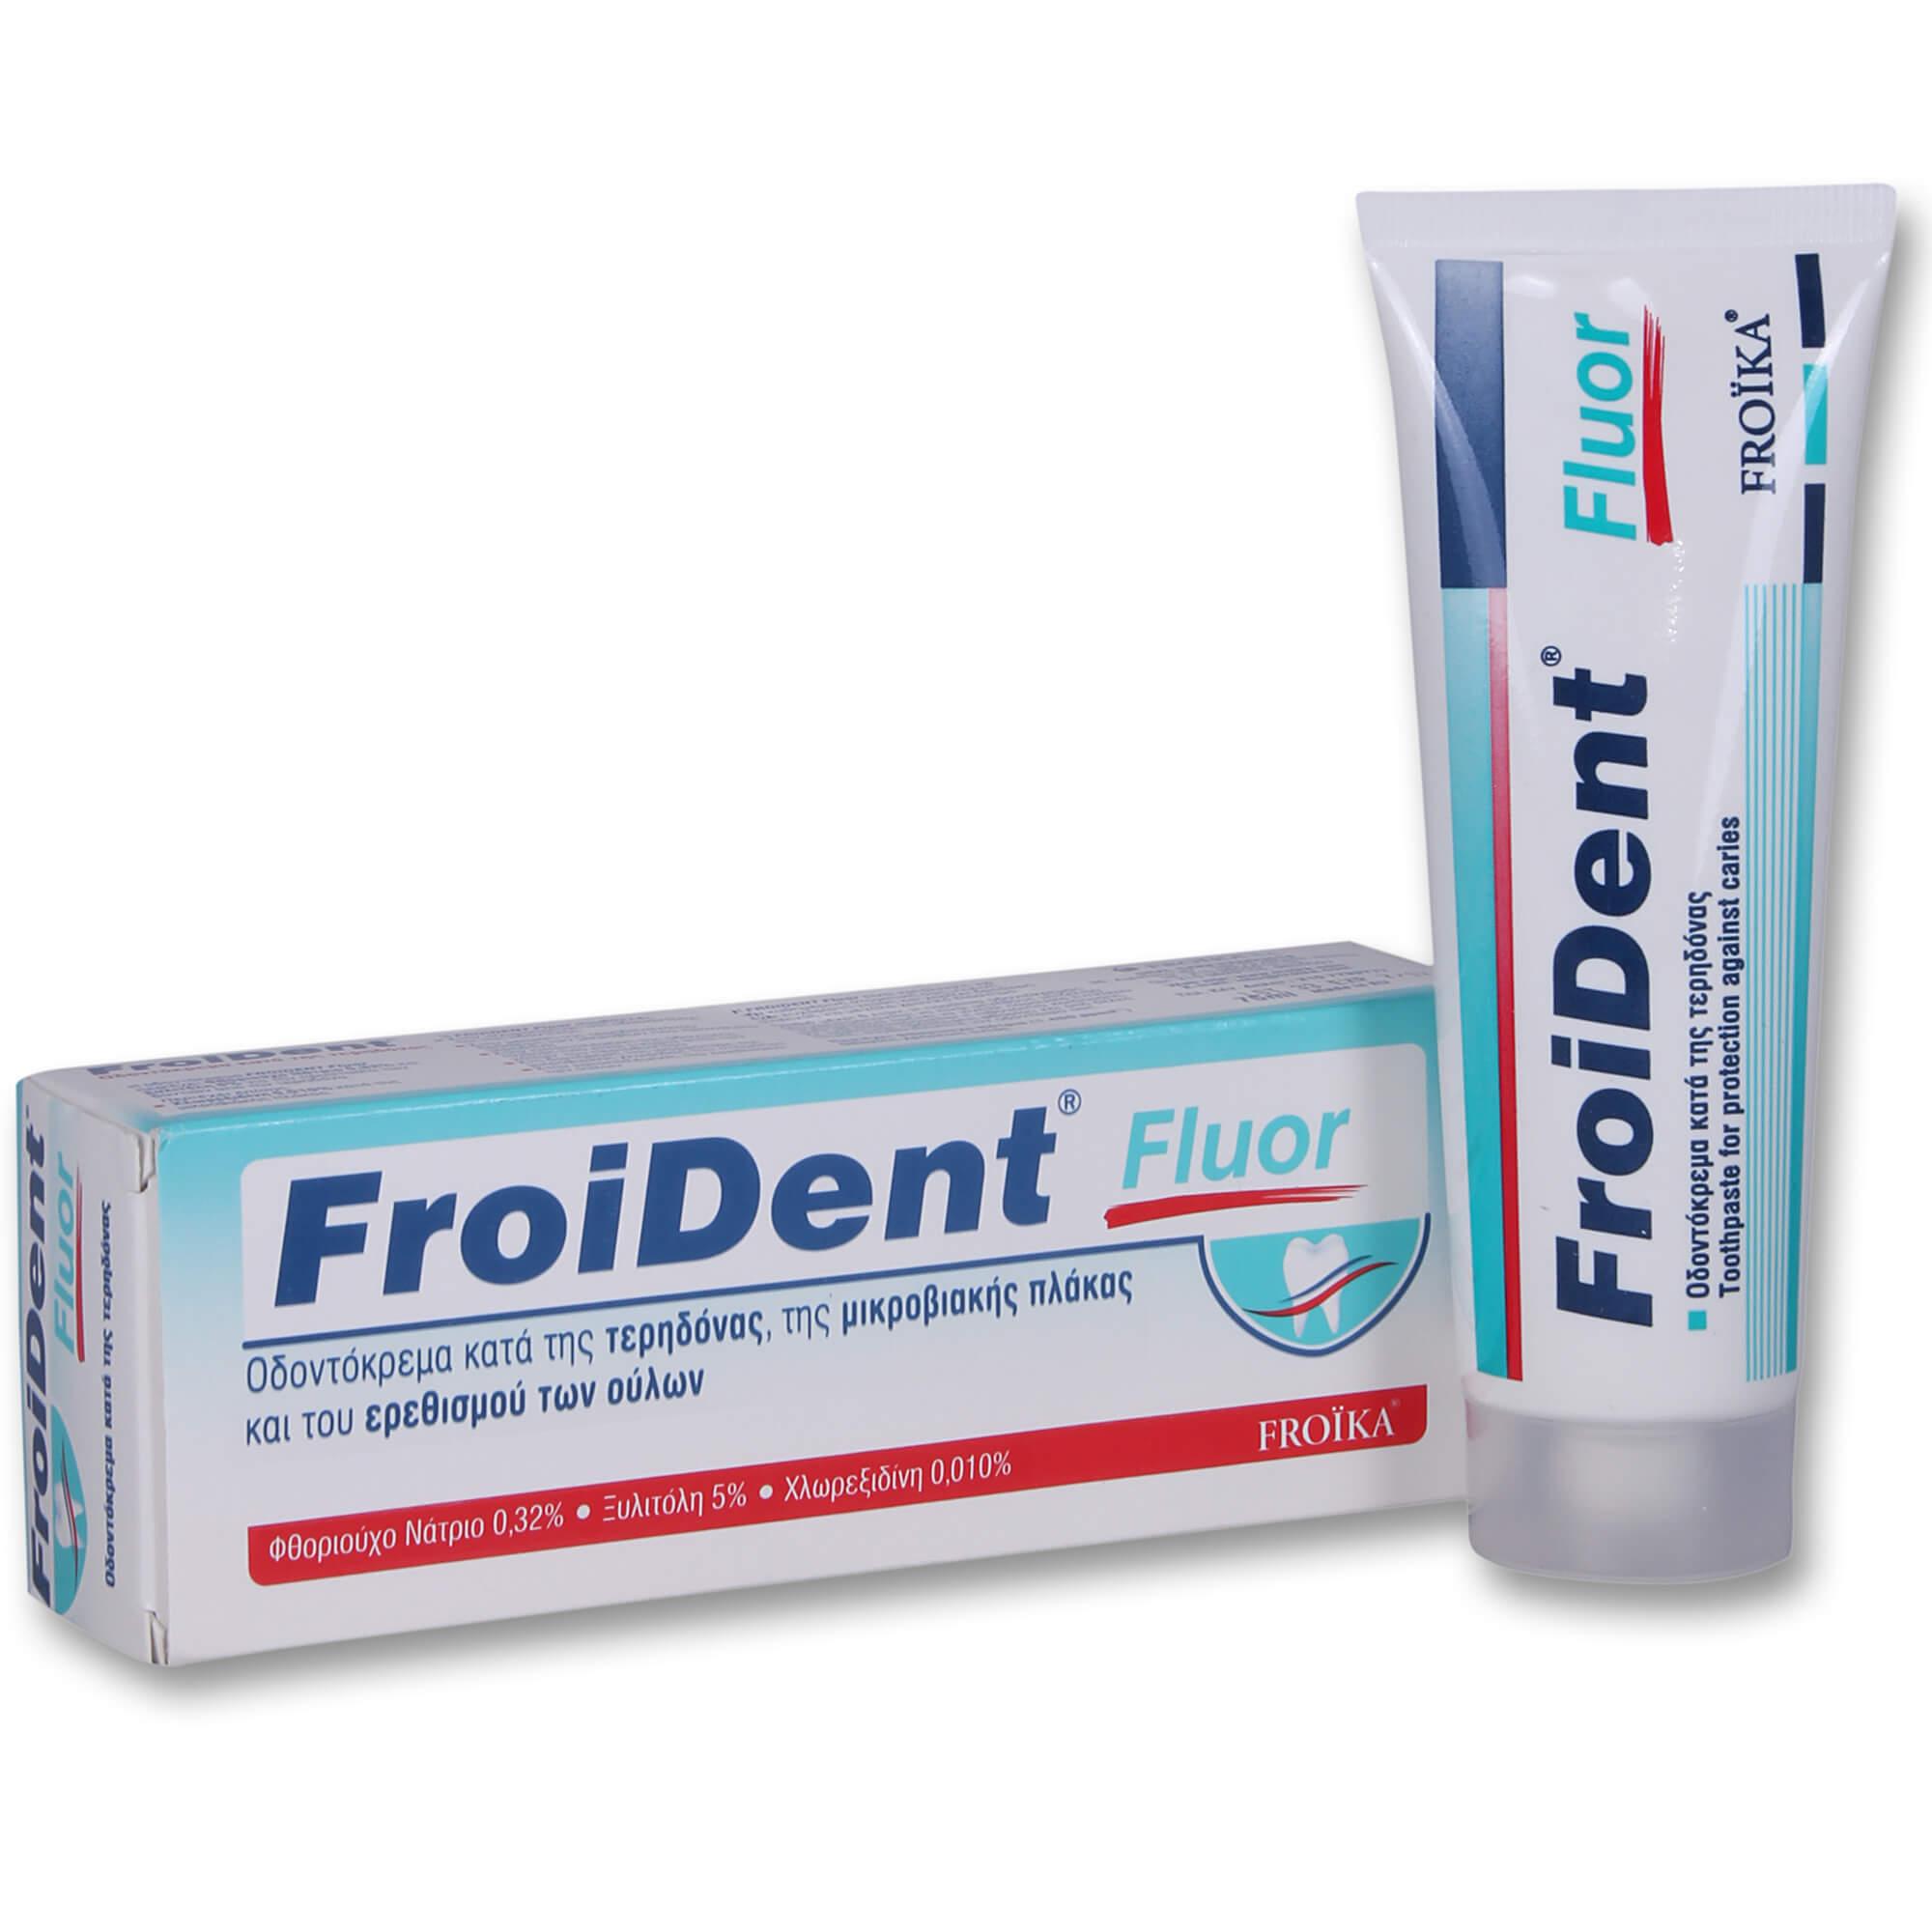 Froika Froident Fluor Toothpaste Οδοντόκρεμα Κατά της Τερηδόνας, της Μικροβιακής Πλάκας & του Ερεθισμού των Ούλων 75ml